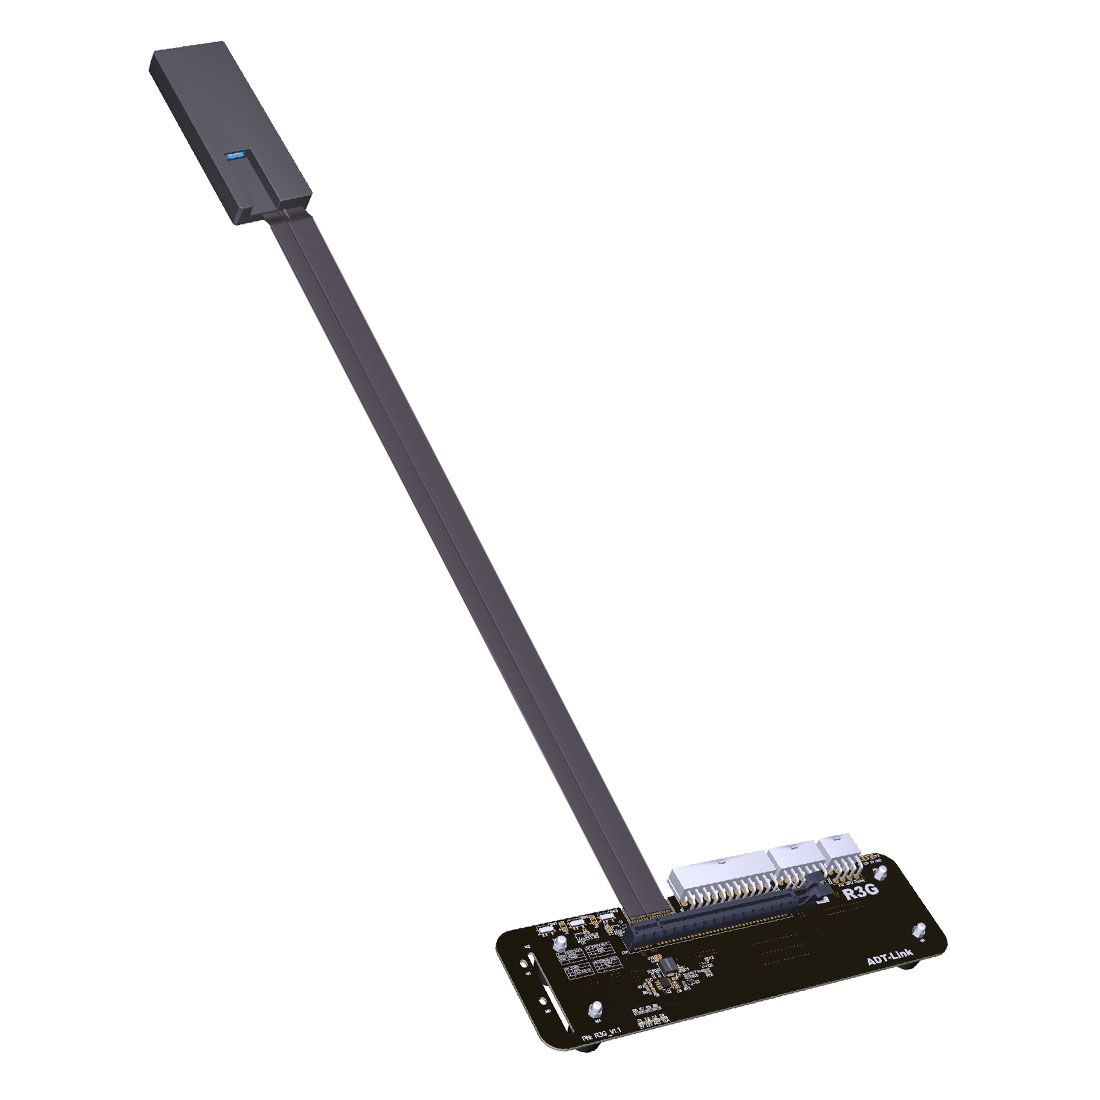 Adt-link R43SG-TB3 PCIe x16 PCI-e x16 do TB3 przedłużacz pci-express kable Adapter eGPU